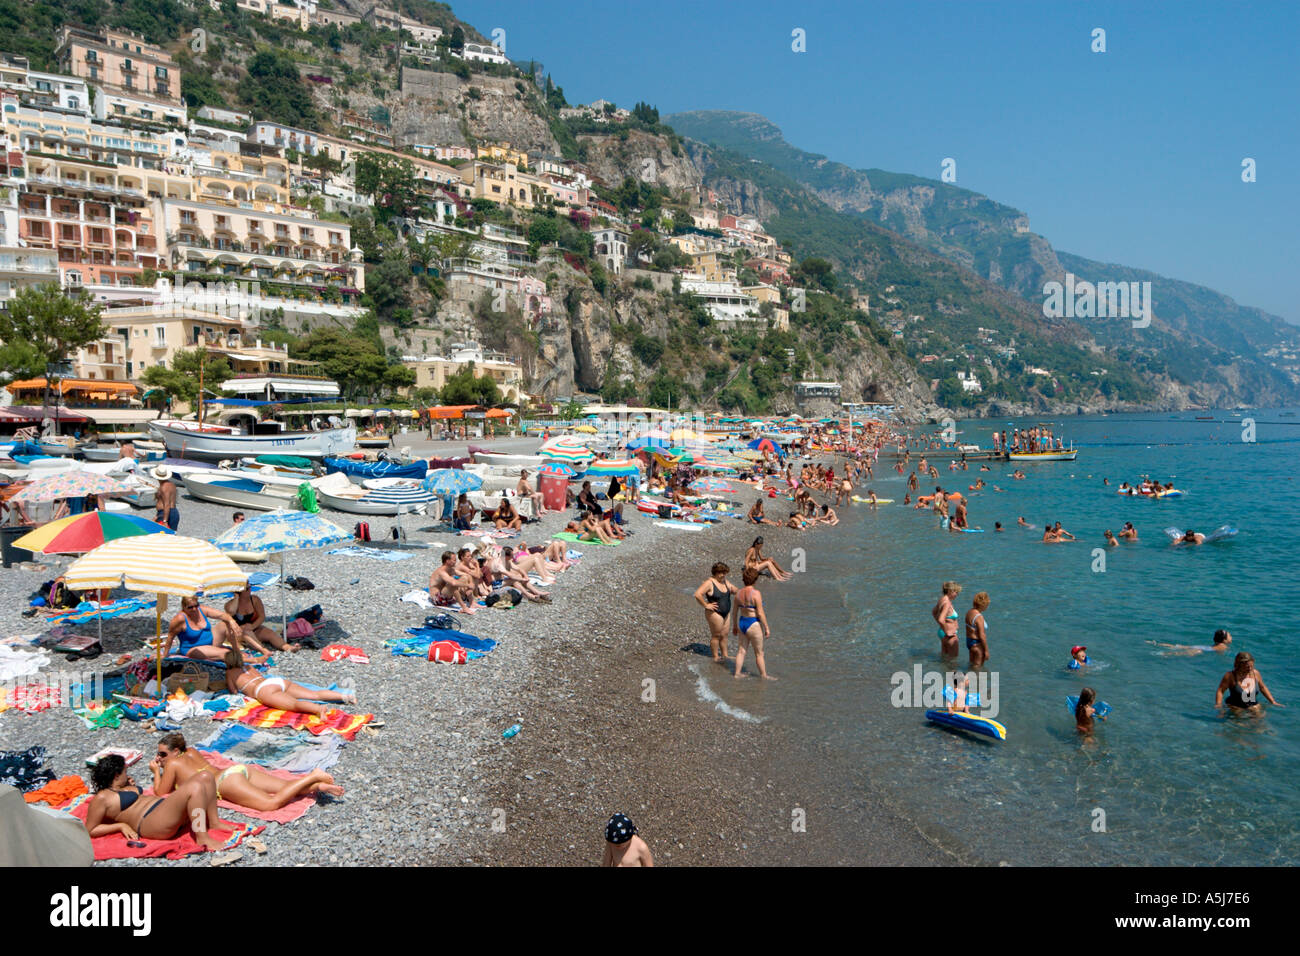 Beach Resorts Near Palermo